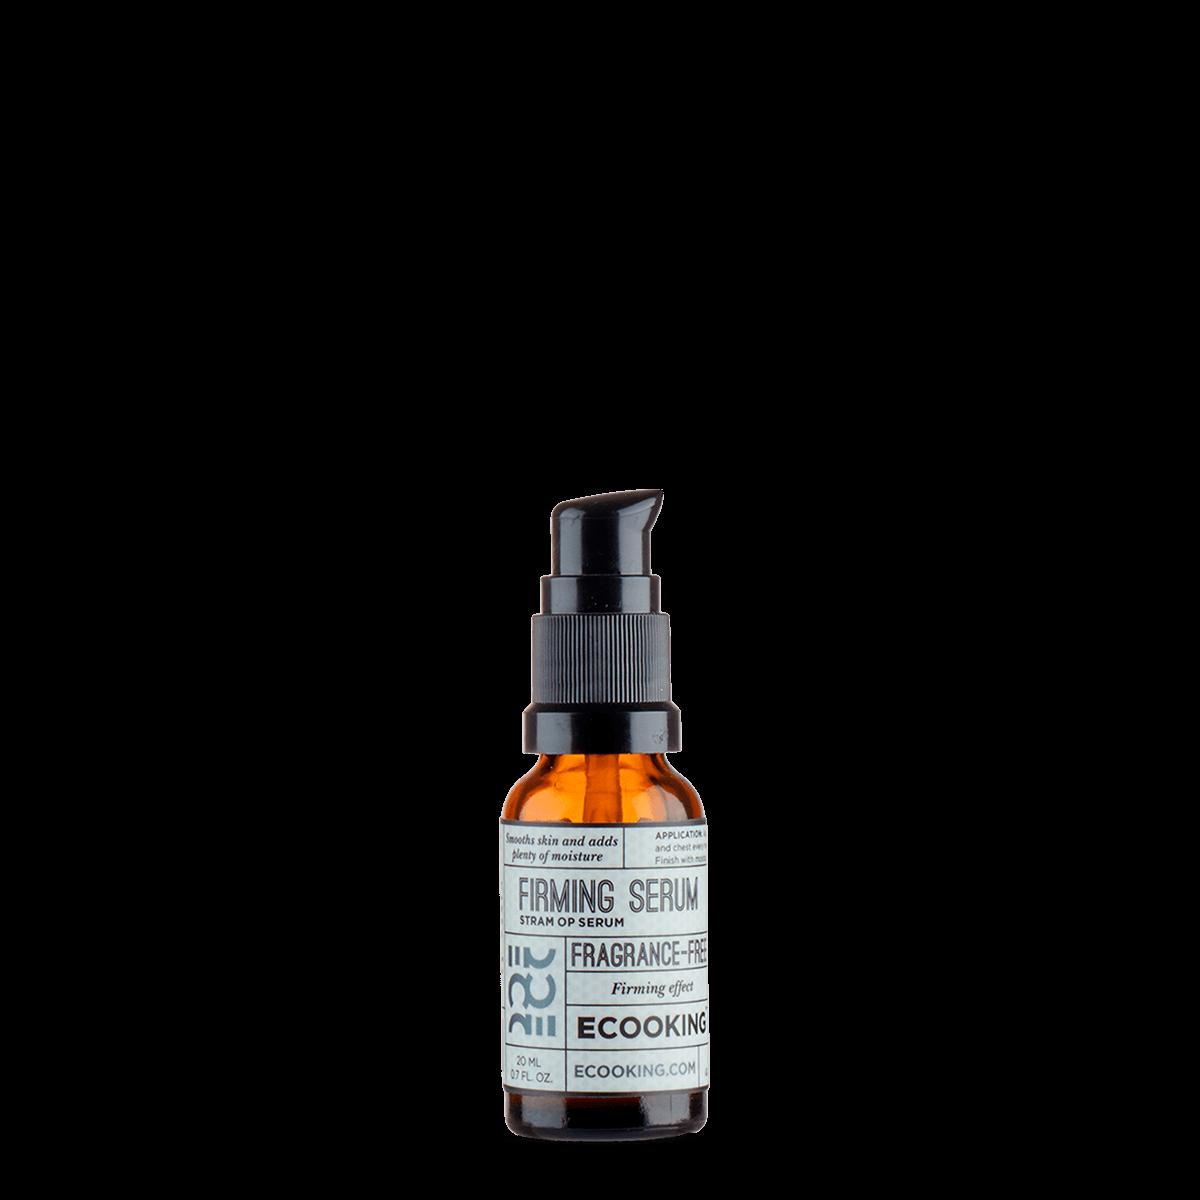 Firming Serum 20 ml